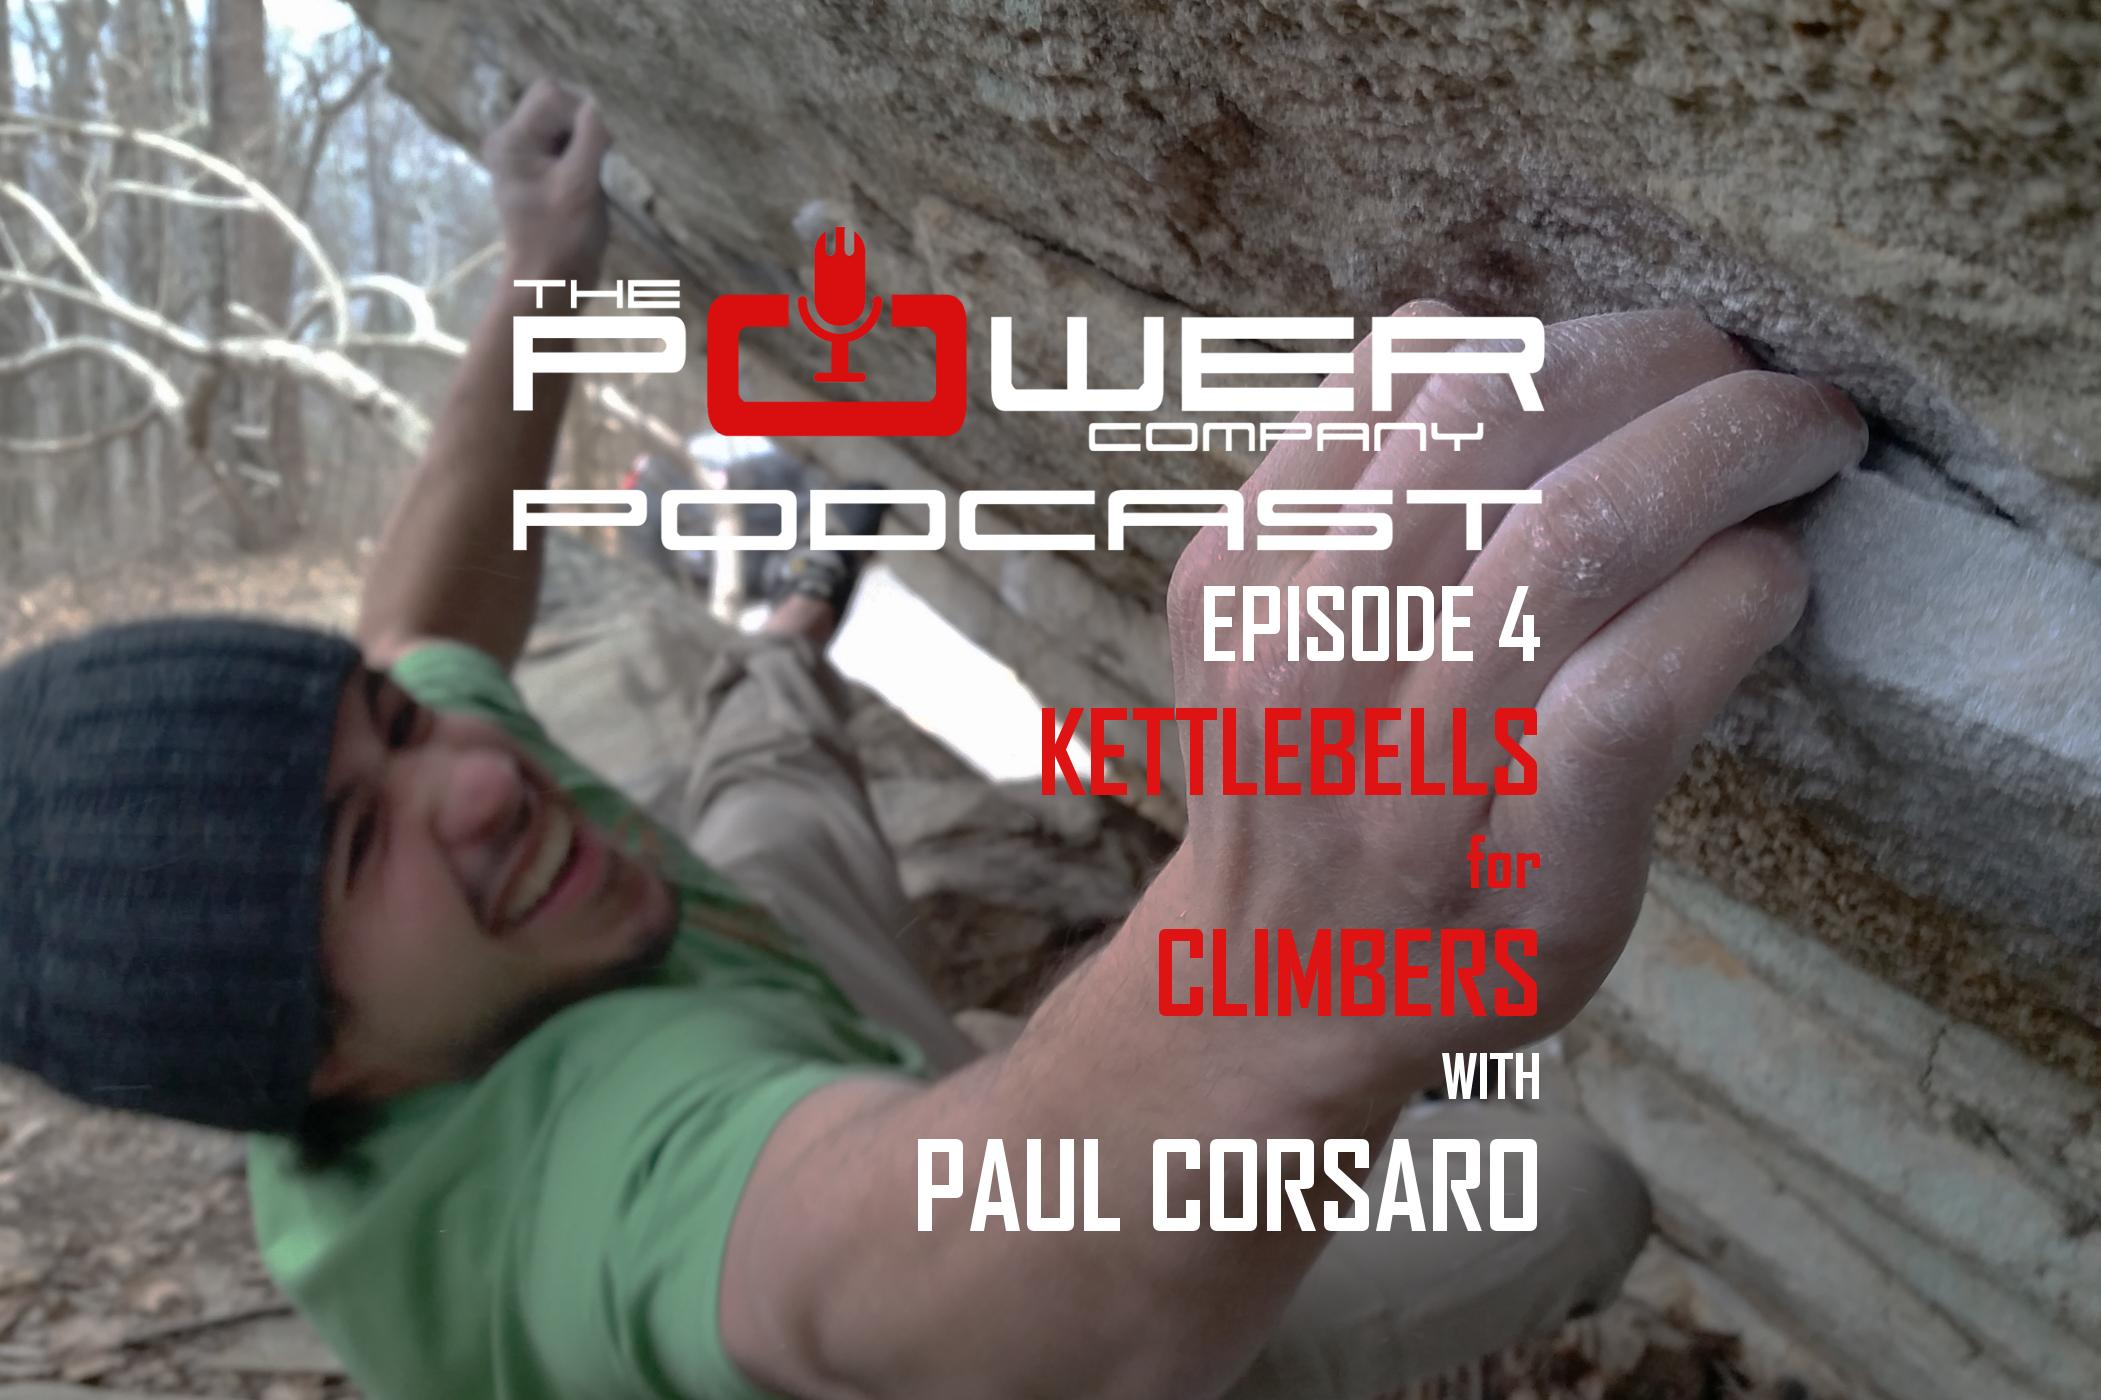 kettlebells for climbers with paul corsaro